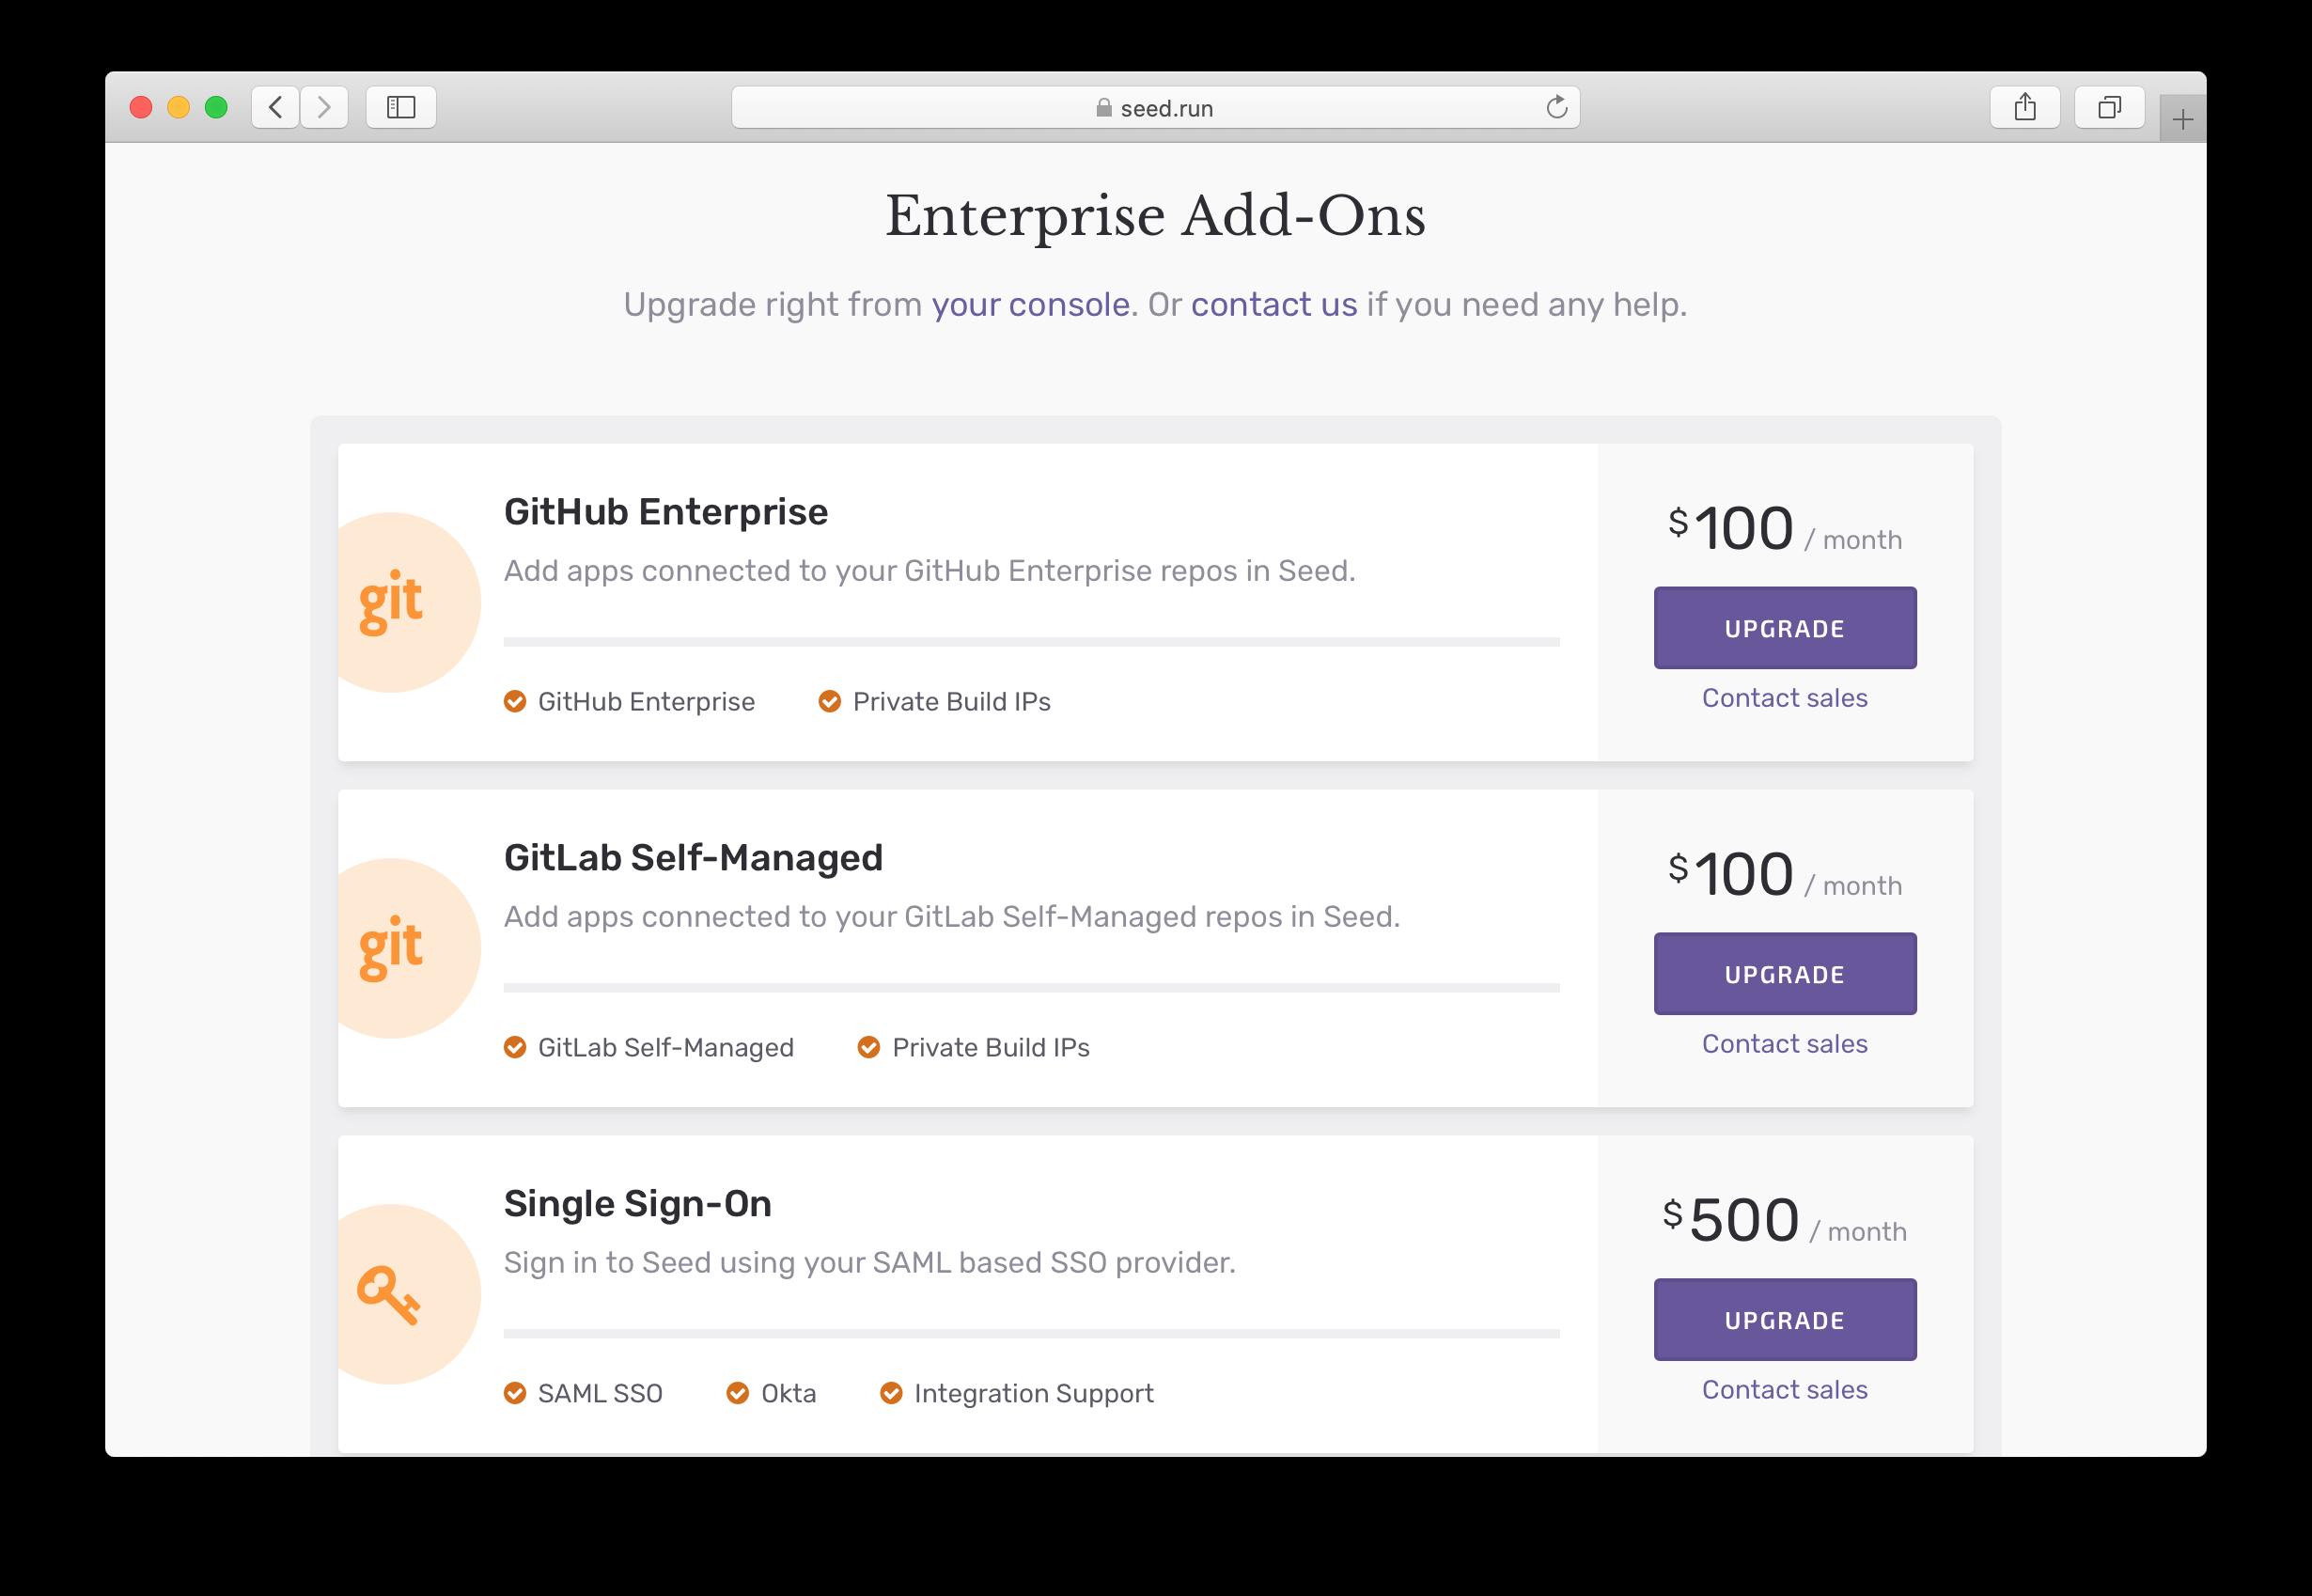 Enterprise Add-Ons in Seed